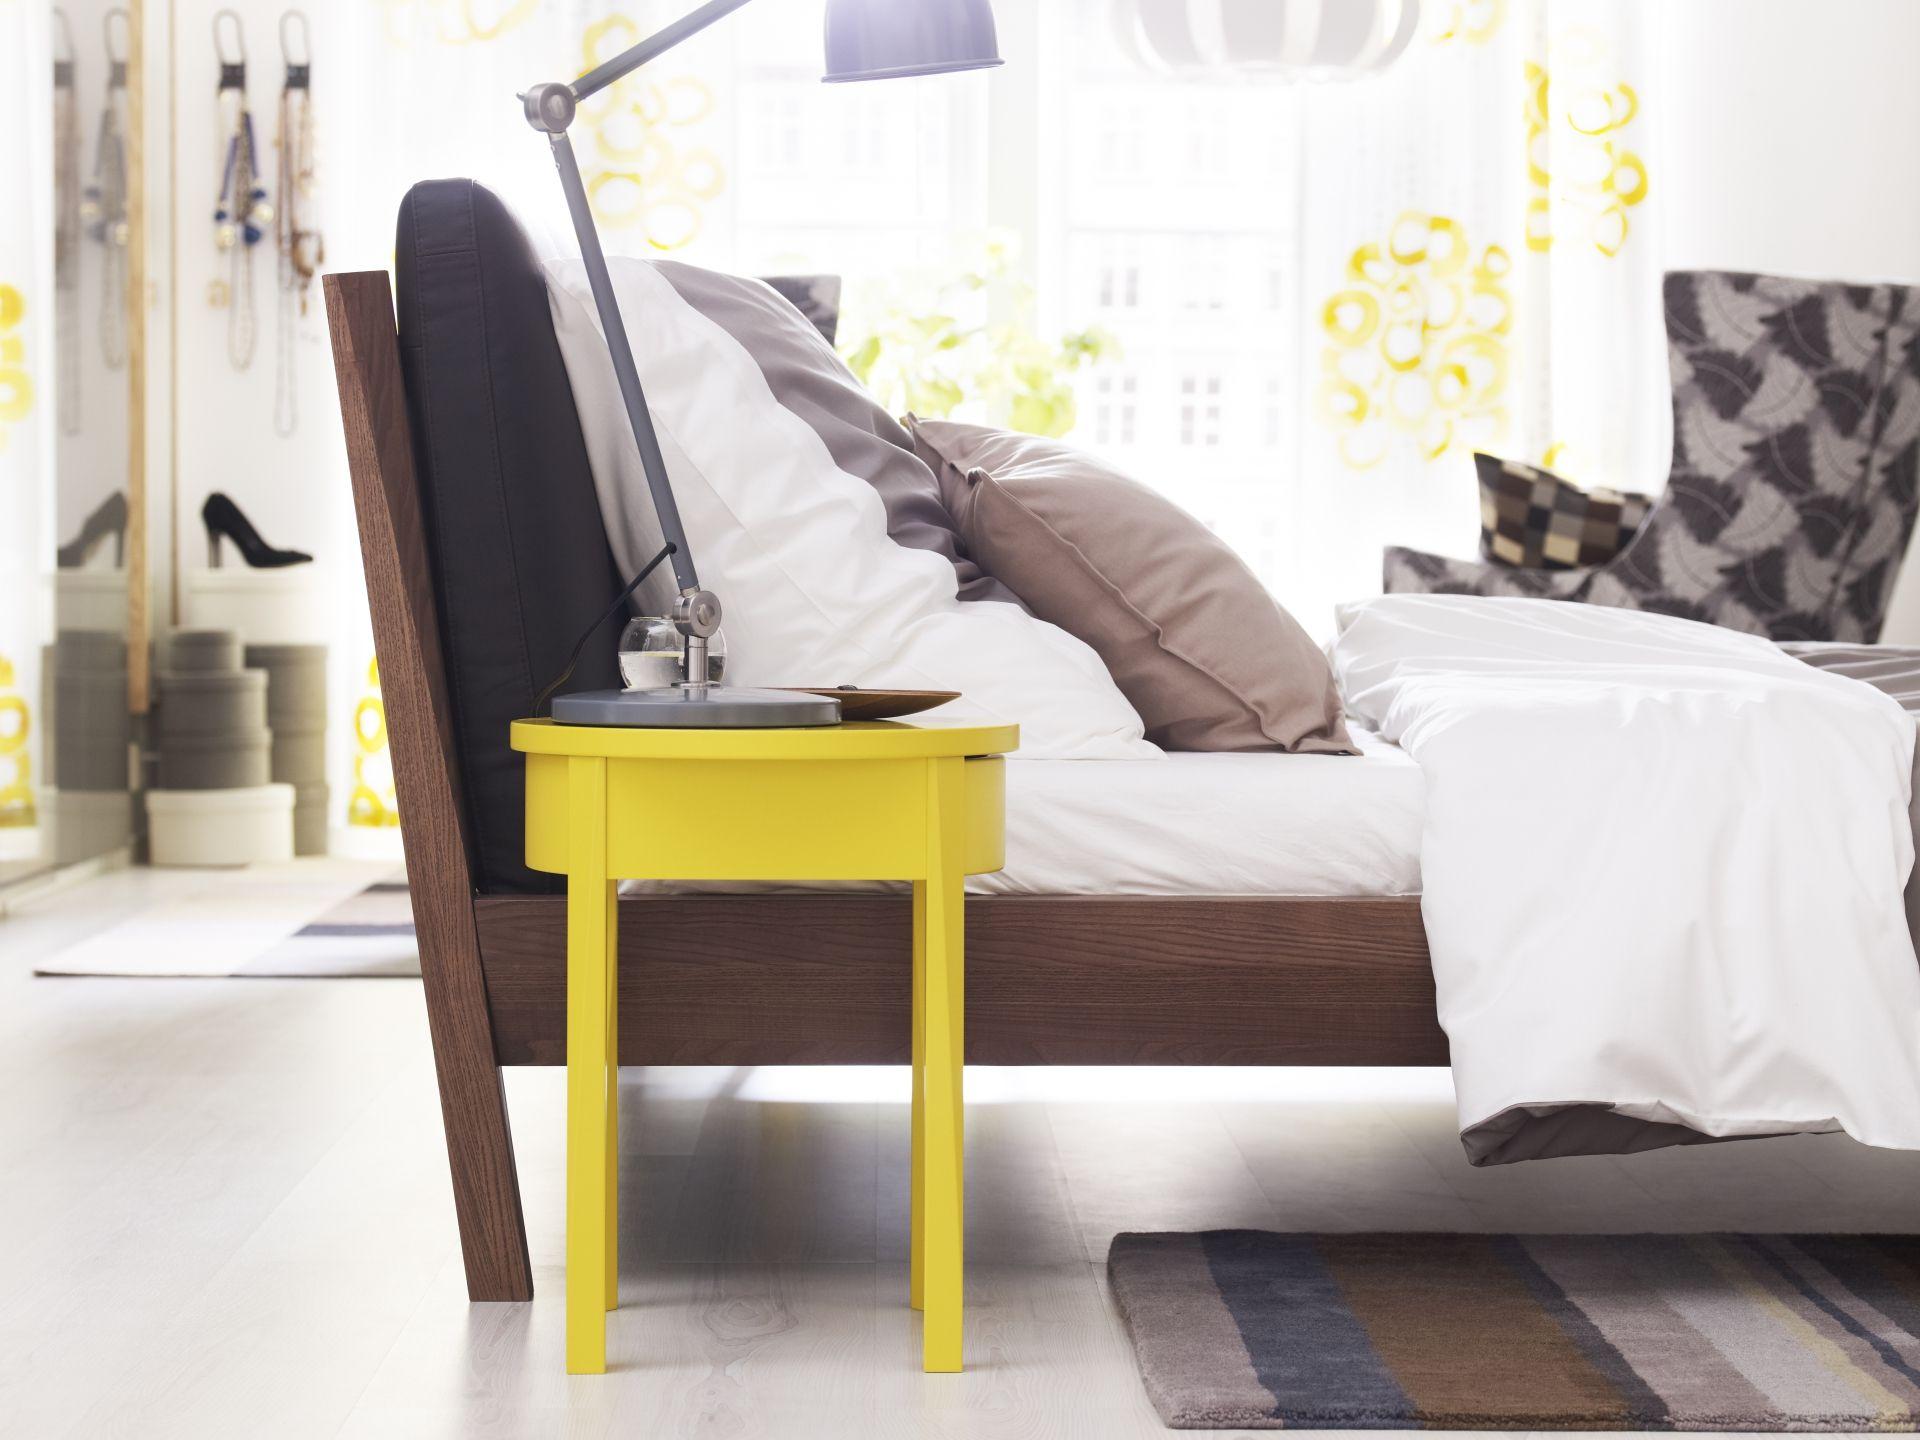 Stockholm nachtkastje ikea ikeanl ikeanederland inspiratie